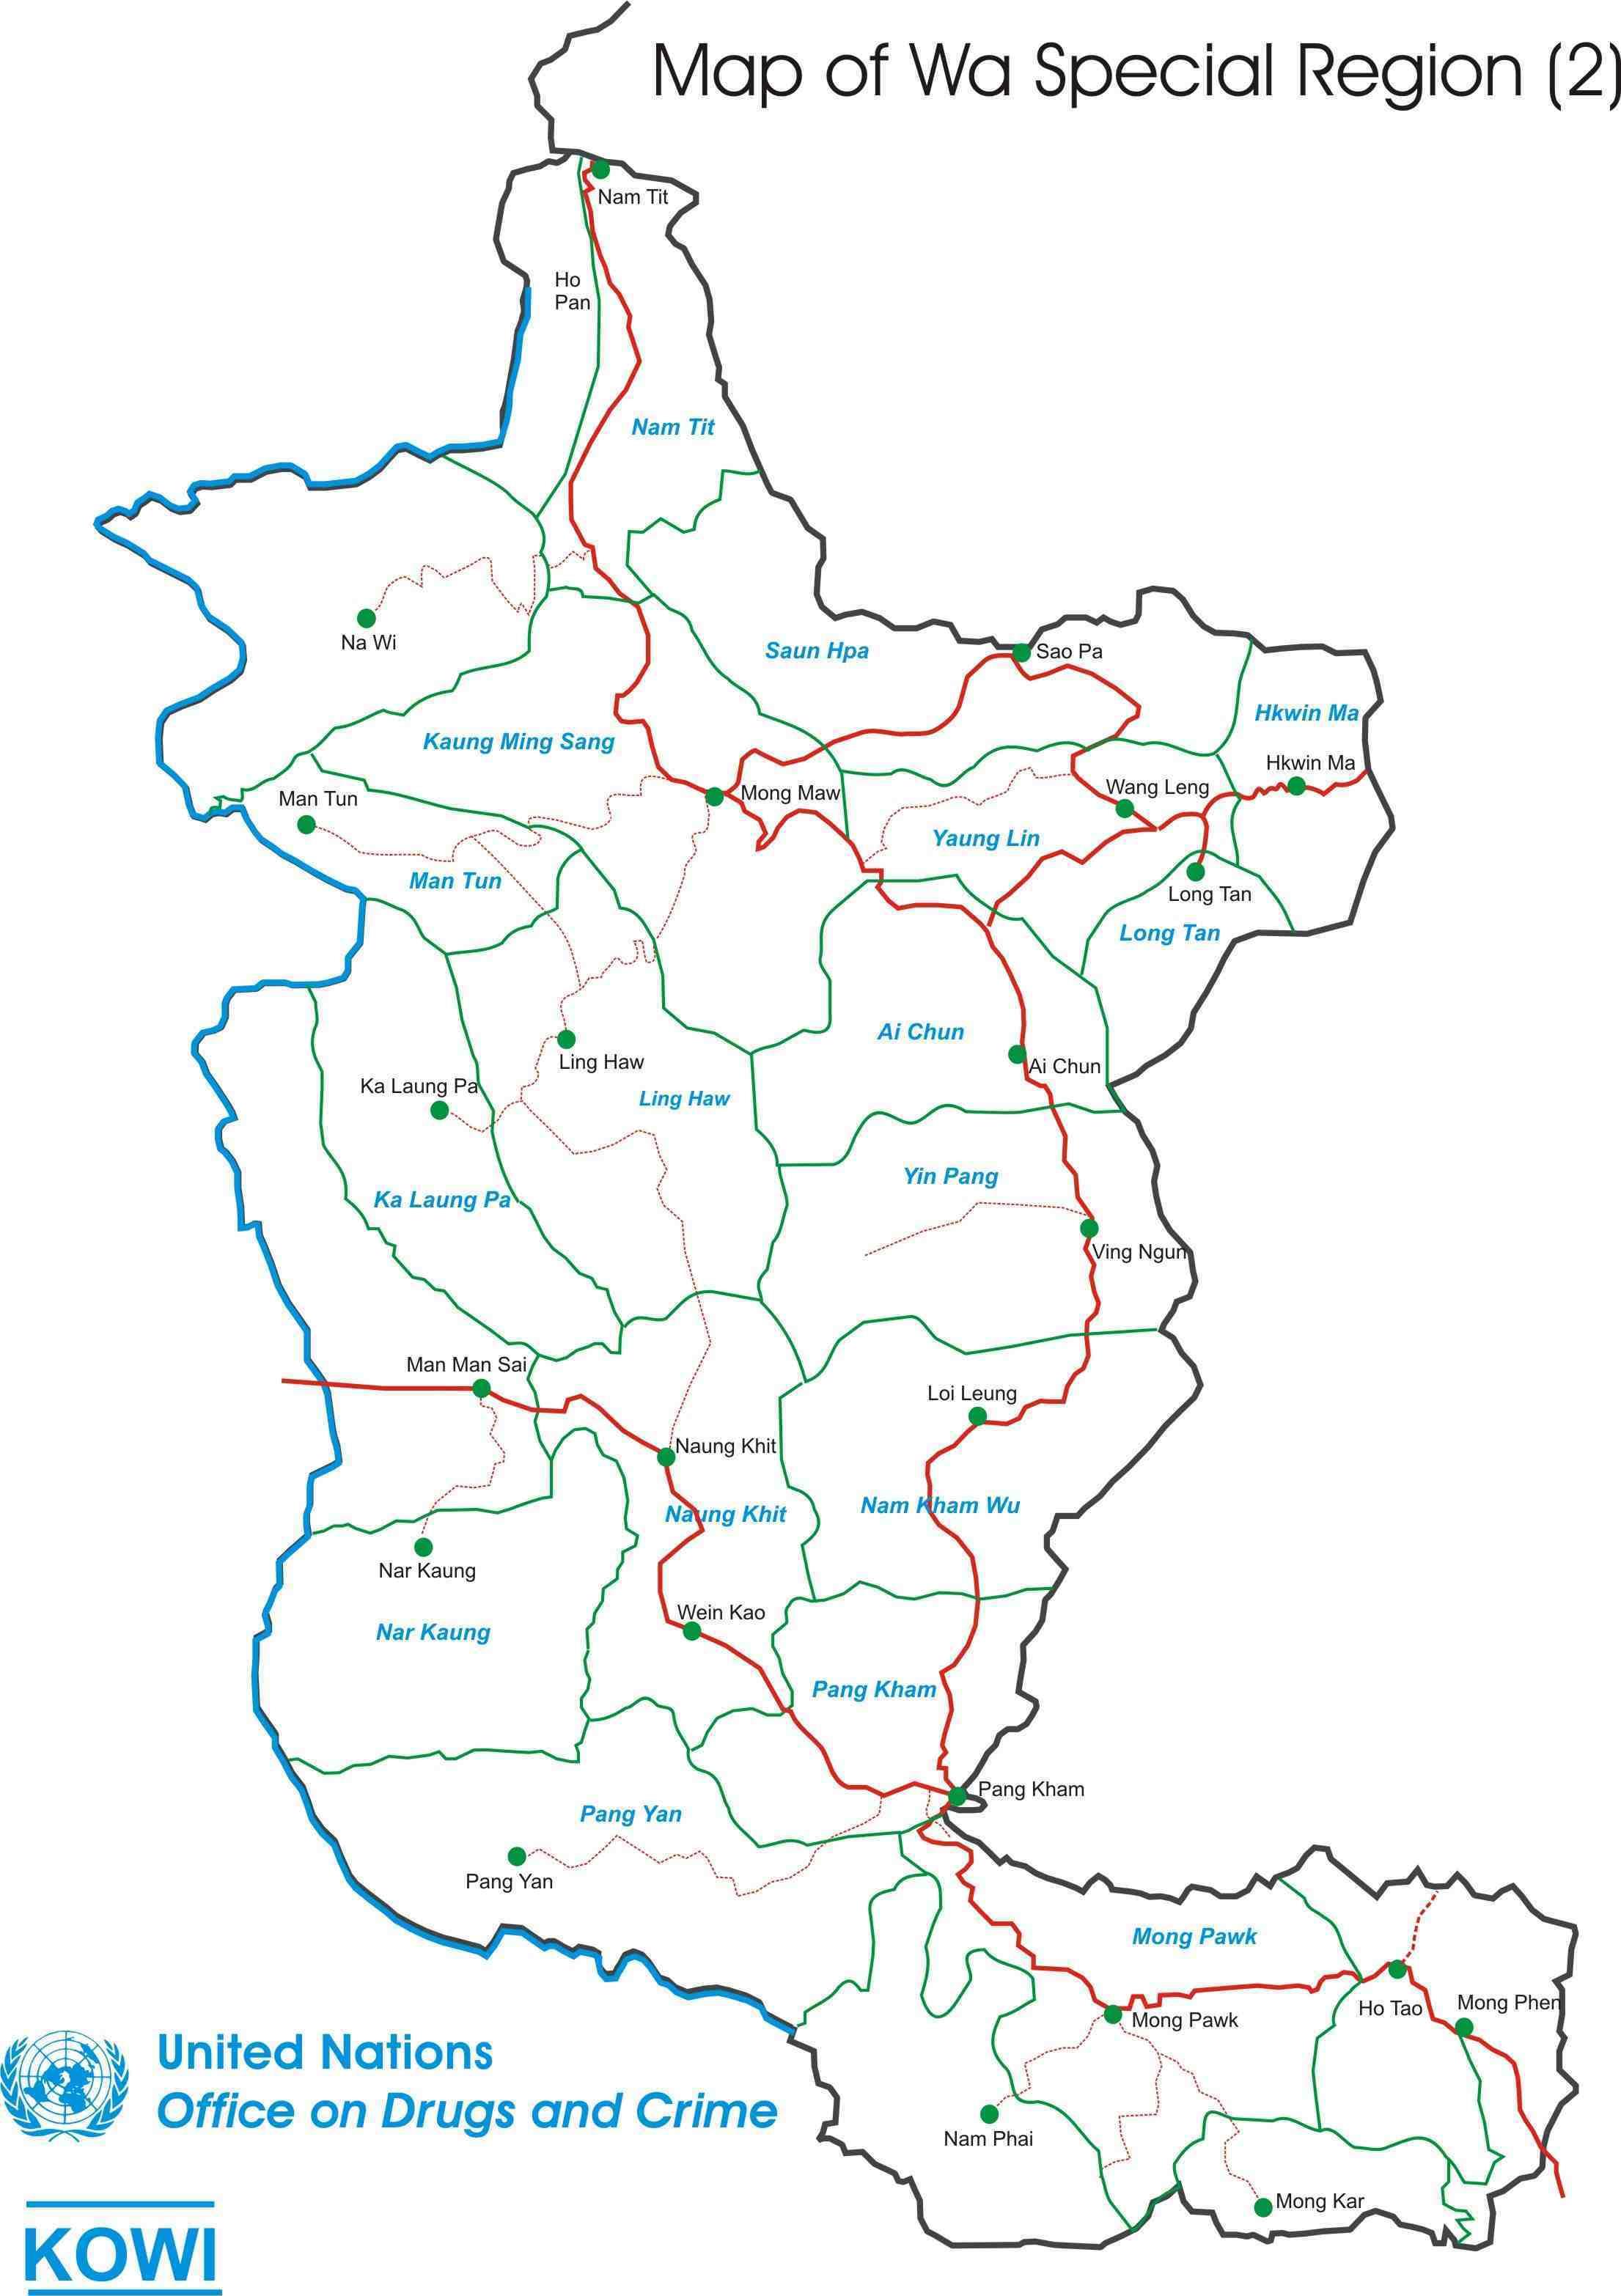 SOAS Wa Dictionary Project Warelated Maps - Map of wa